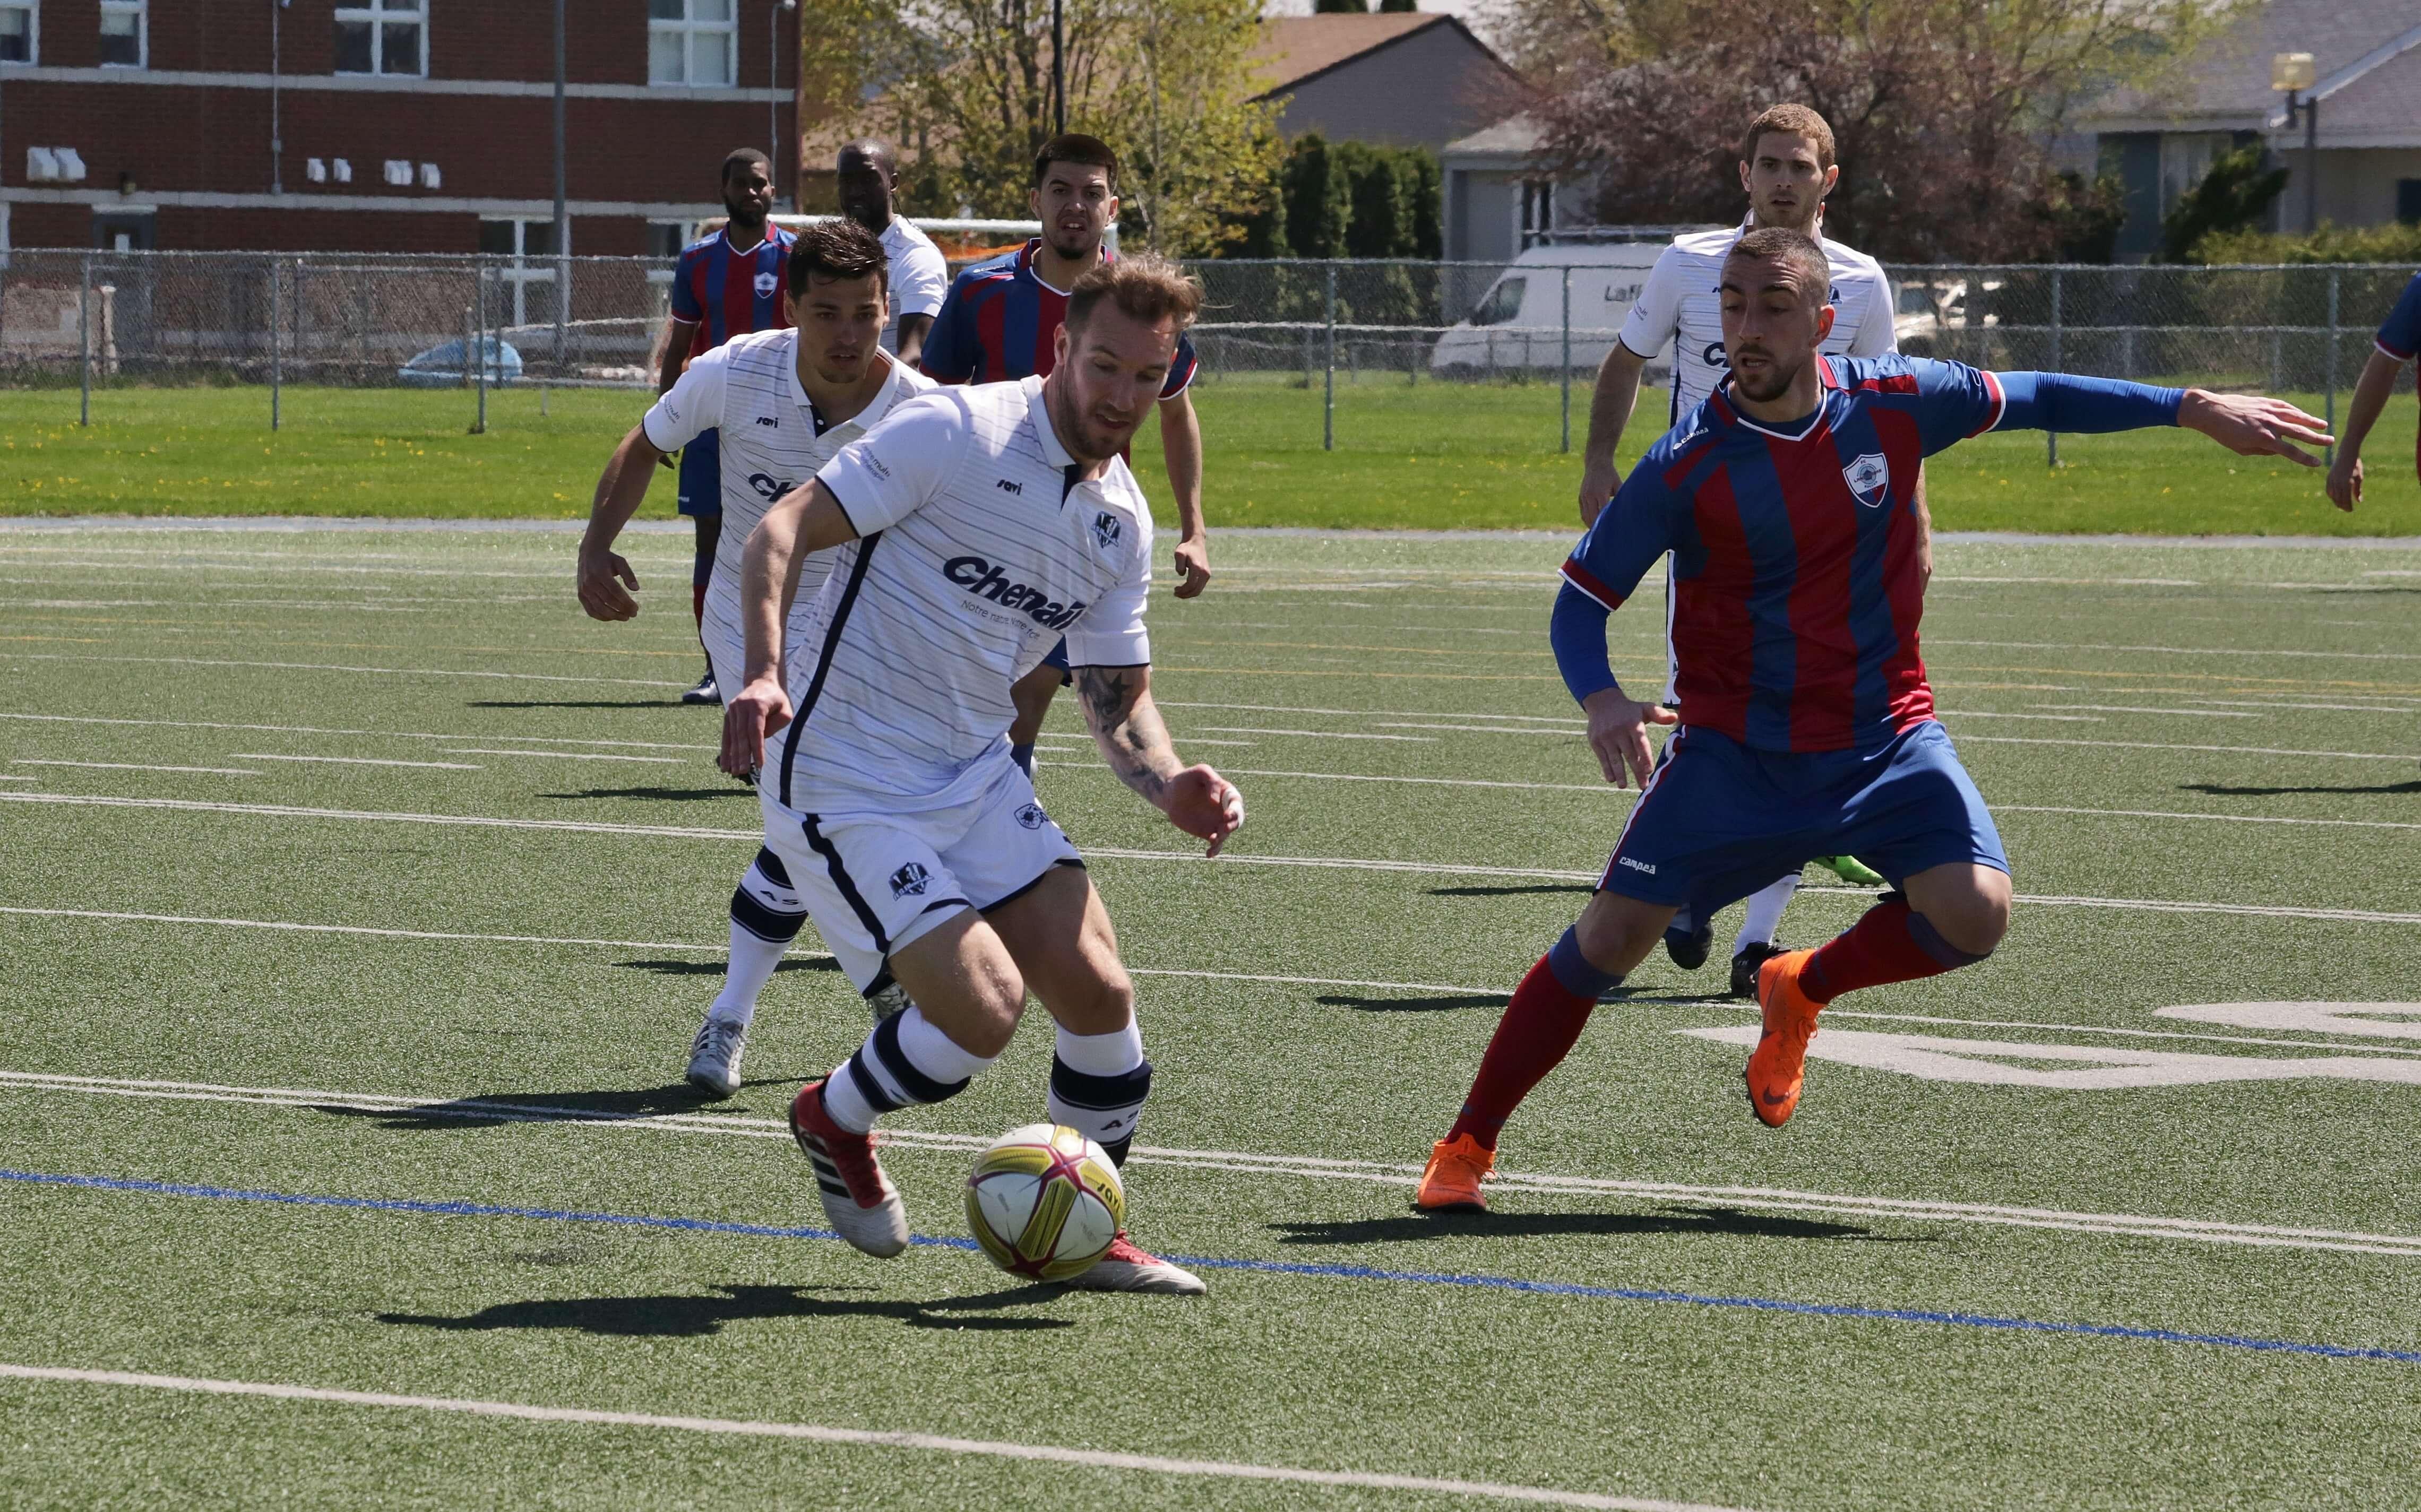 FC soccer